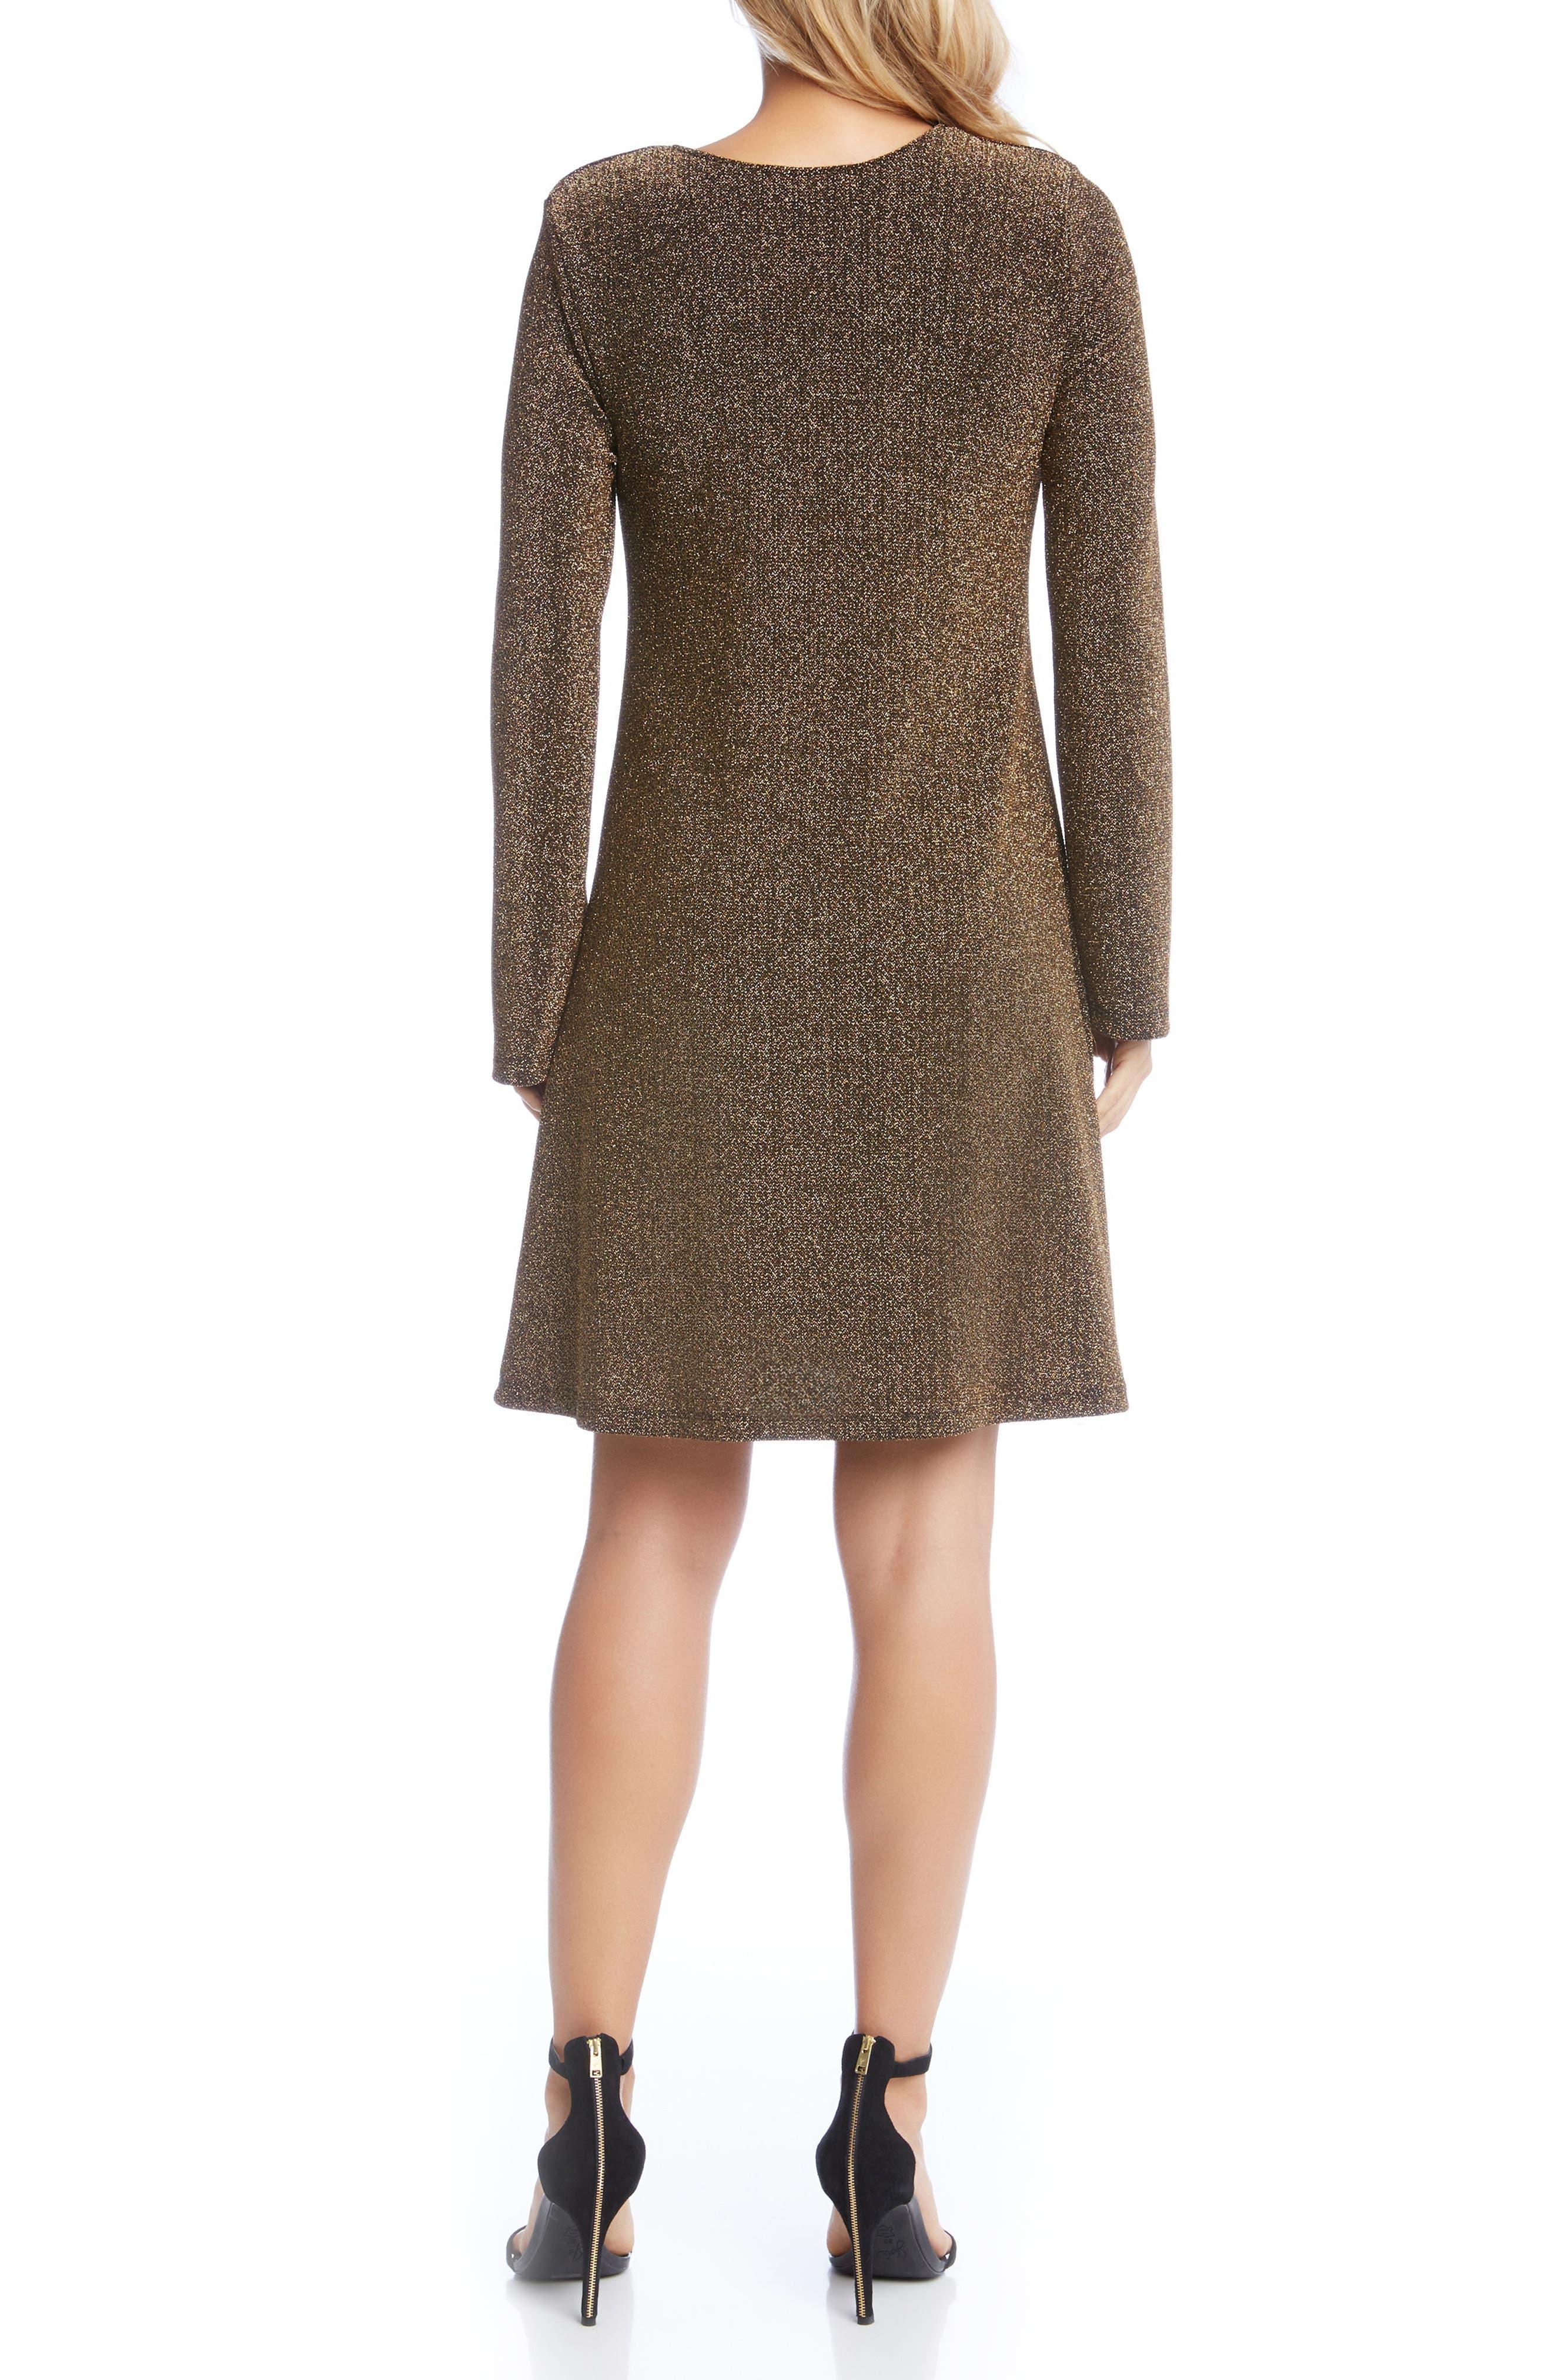 Gold Knit Taylor Dress,                             Alternate thumbnail 2, color,                             710